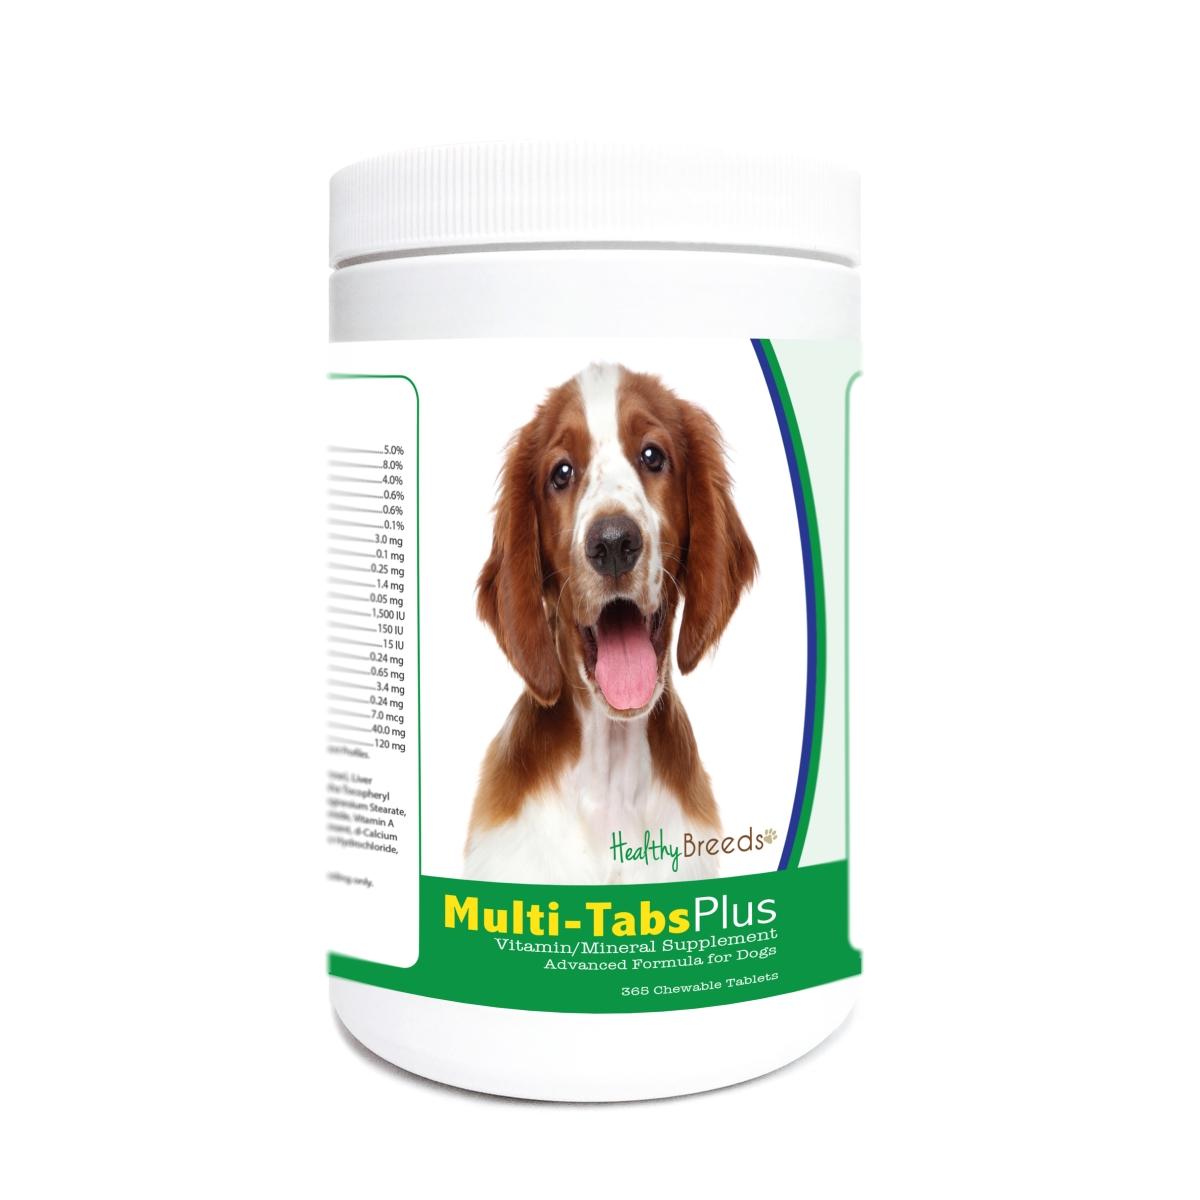 Healthy Breeds 840235177418 Welsh Springer Spaniel Multi-Tabs Plus Chewable Tablets - 365 Count